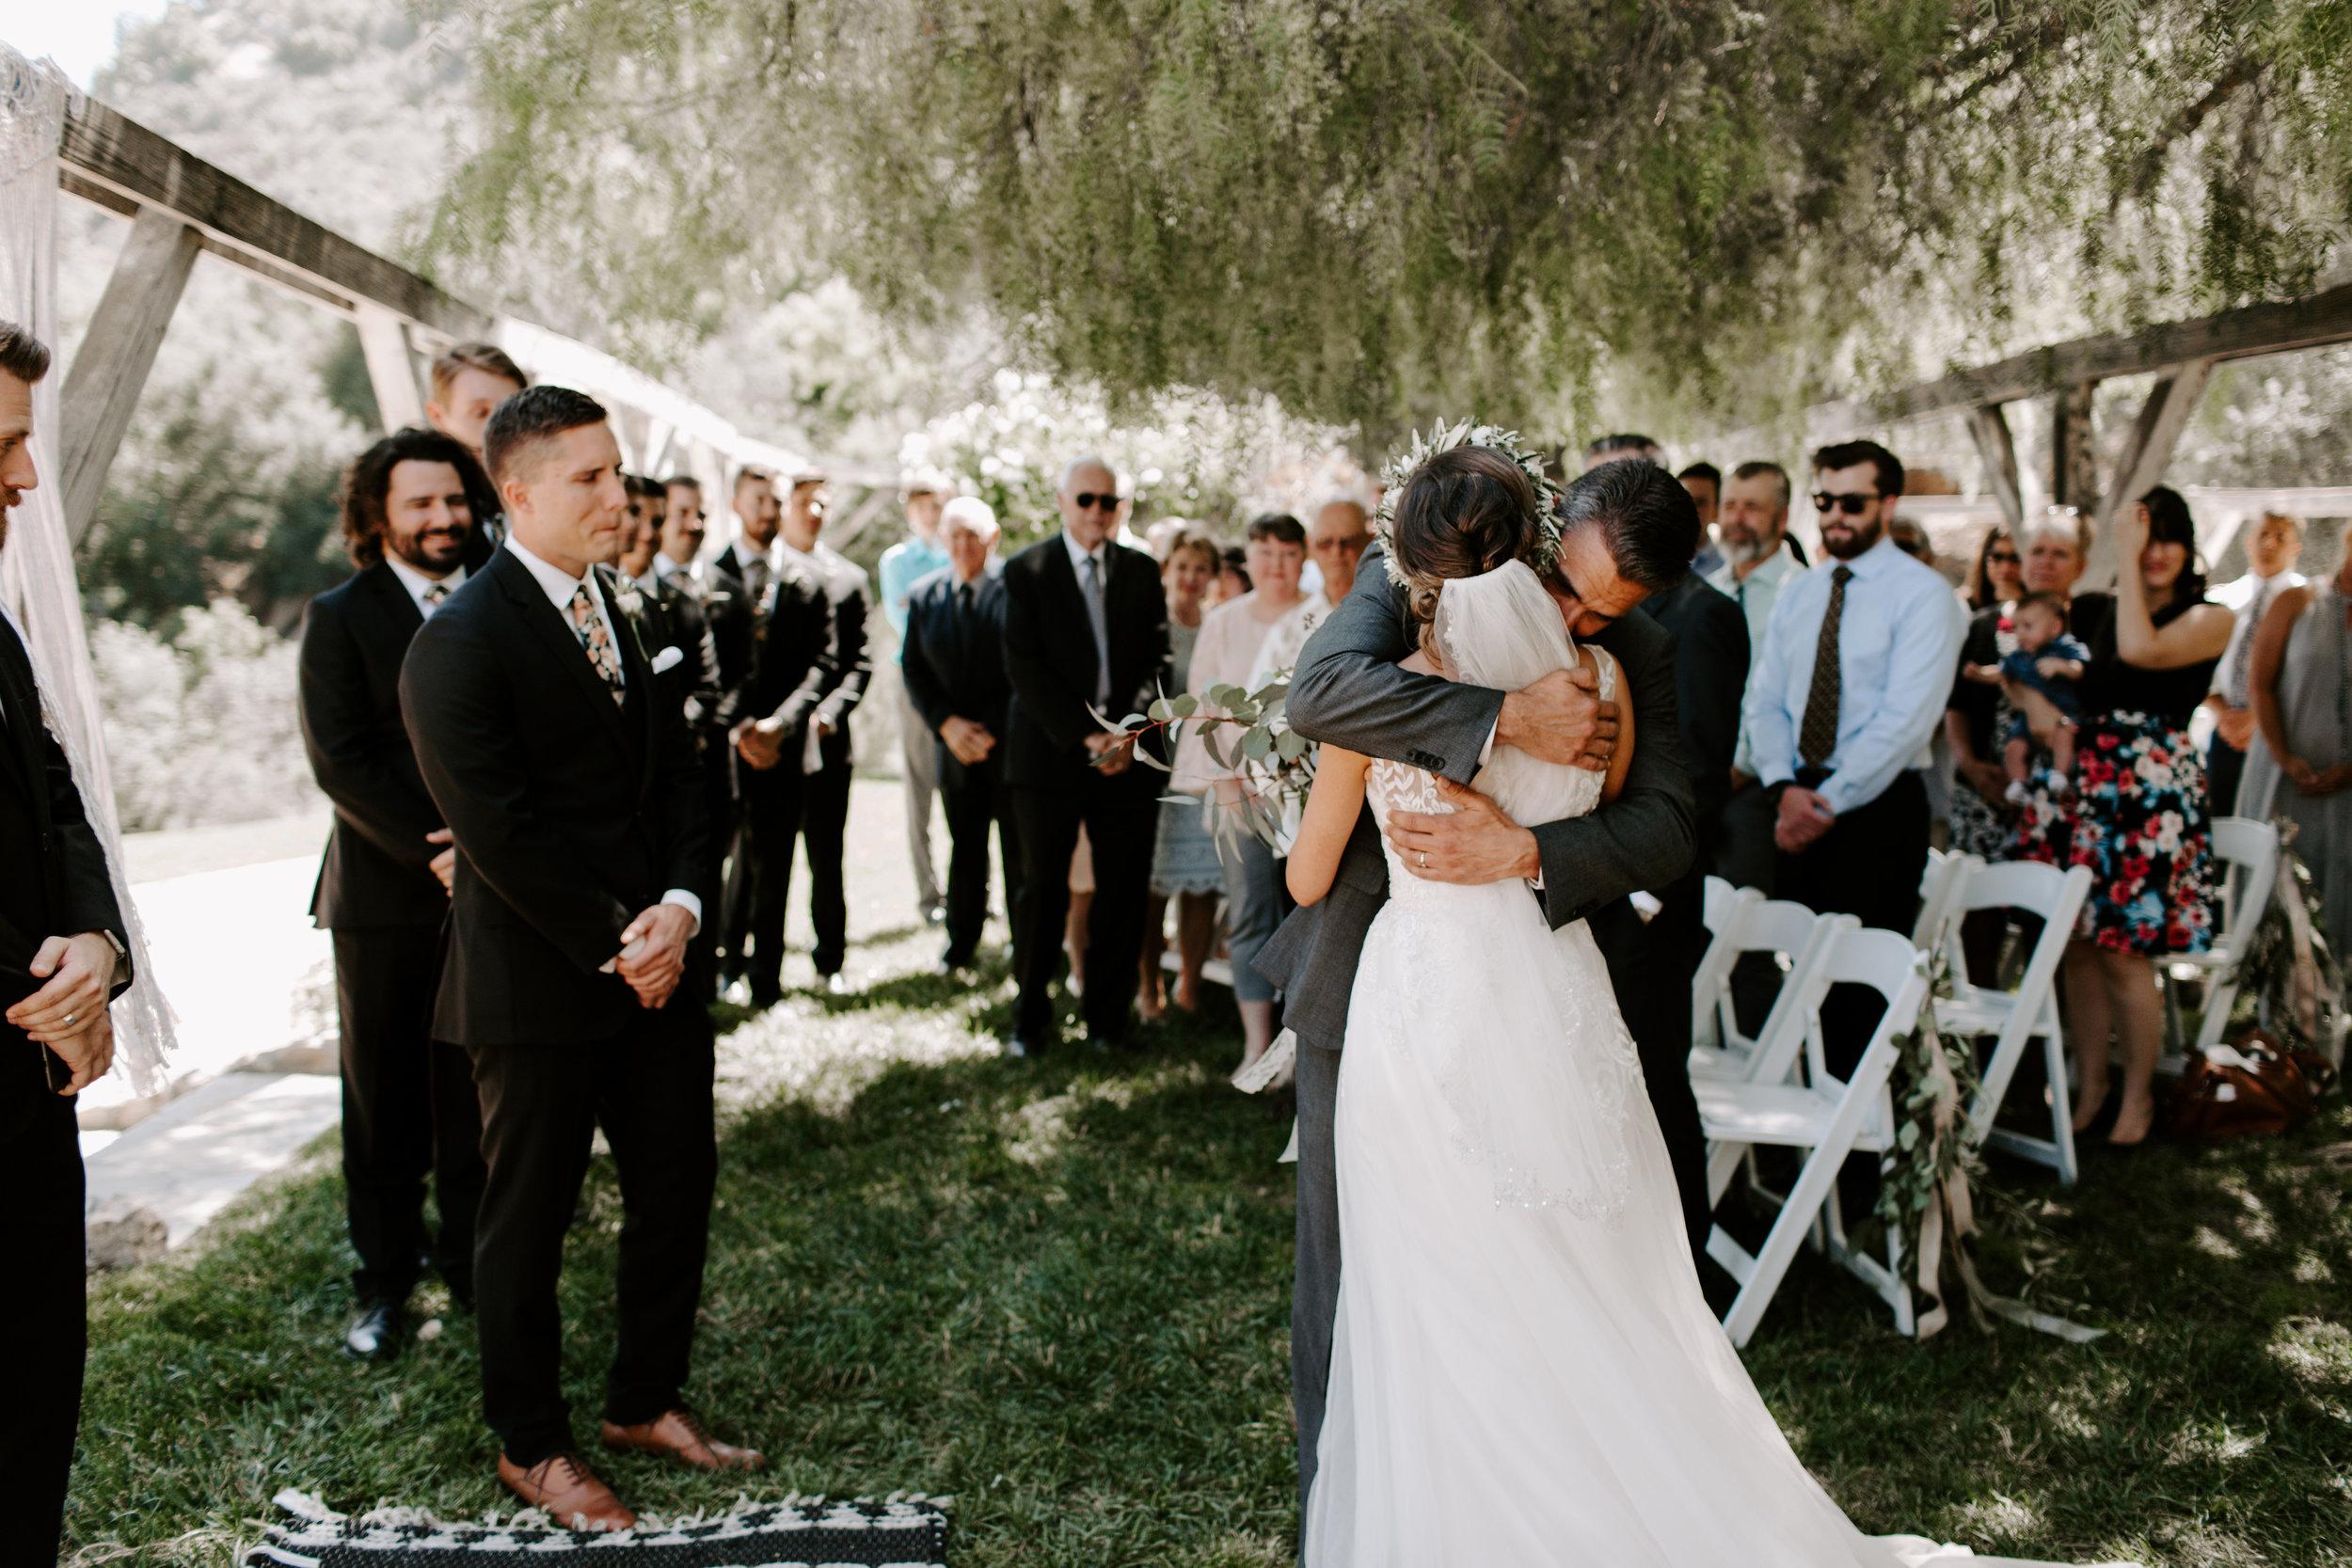 kate+zack_wedding_secludedgardenestate_temecula_madisonrylee_0291.jpg